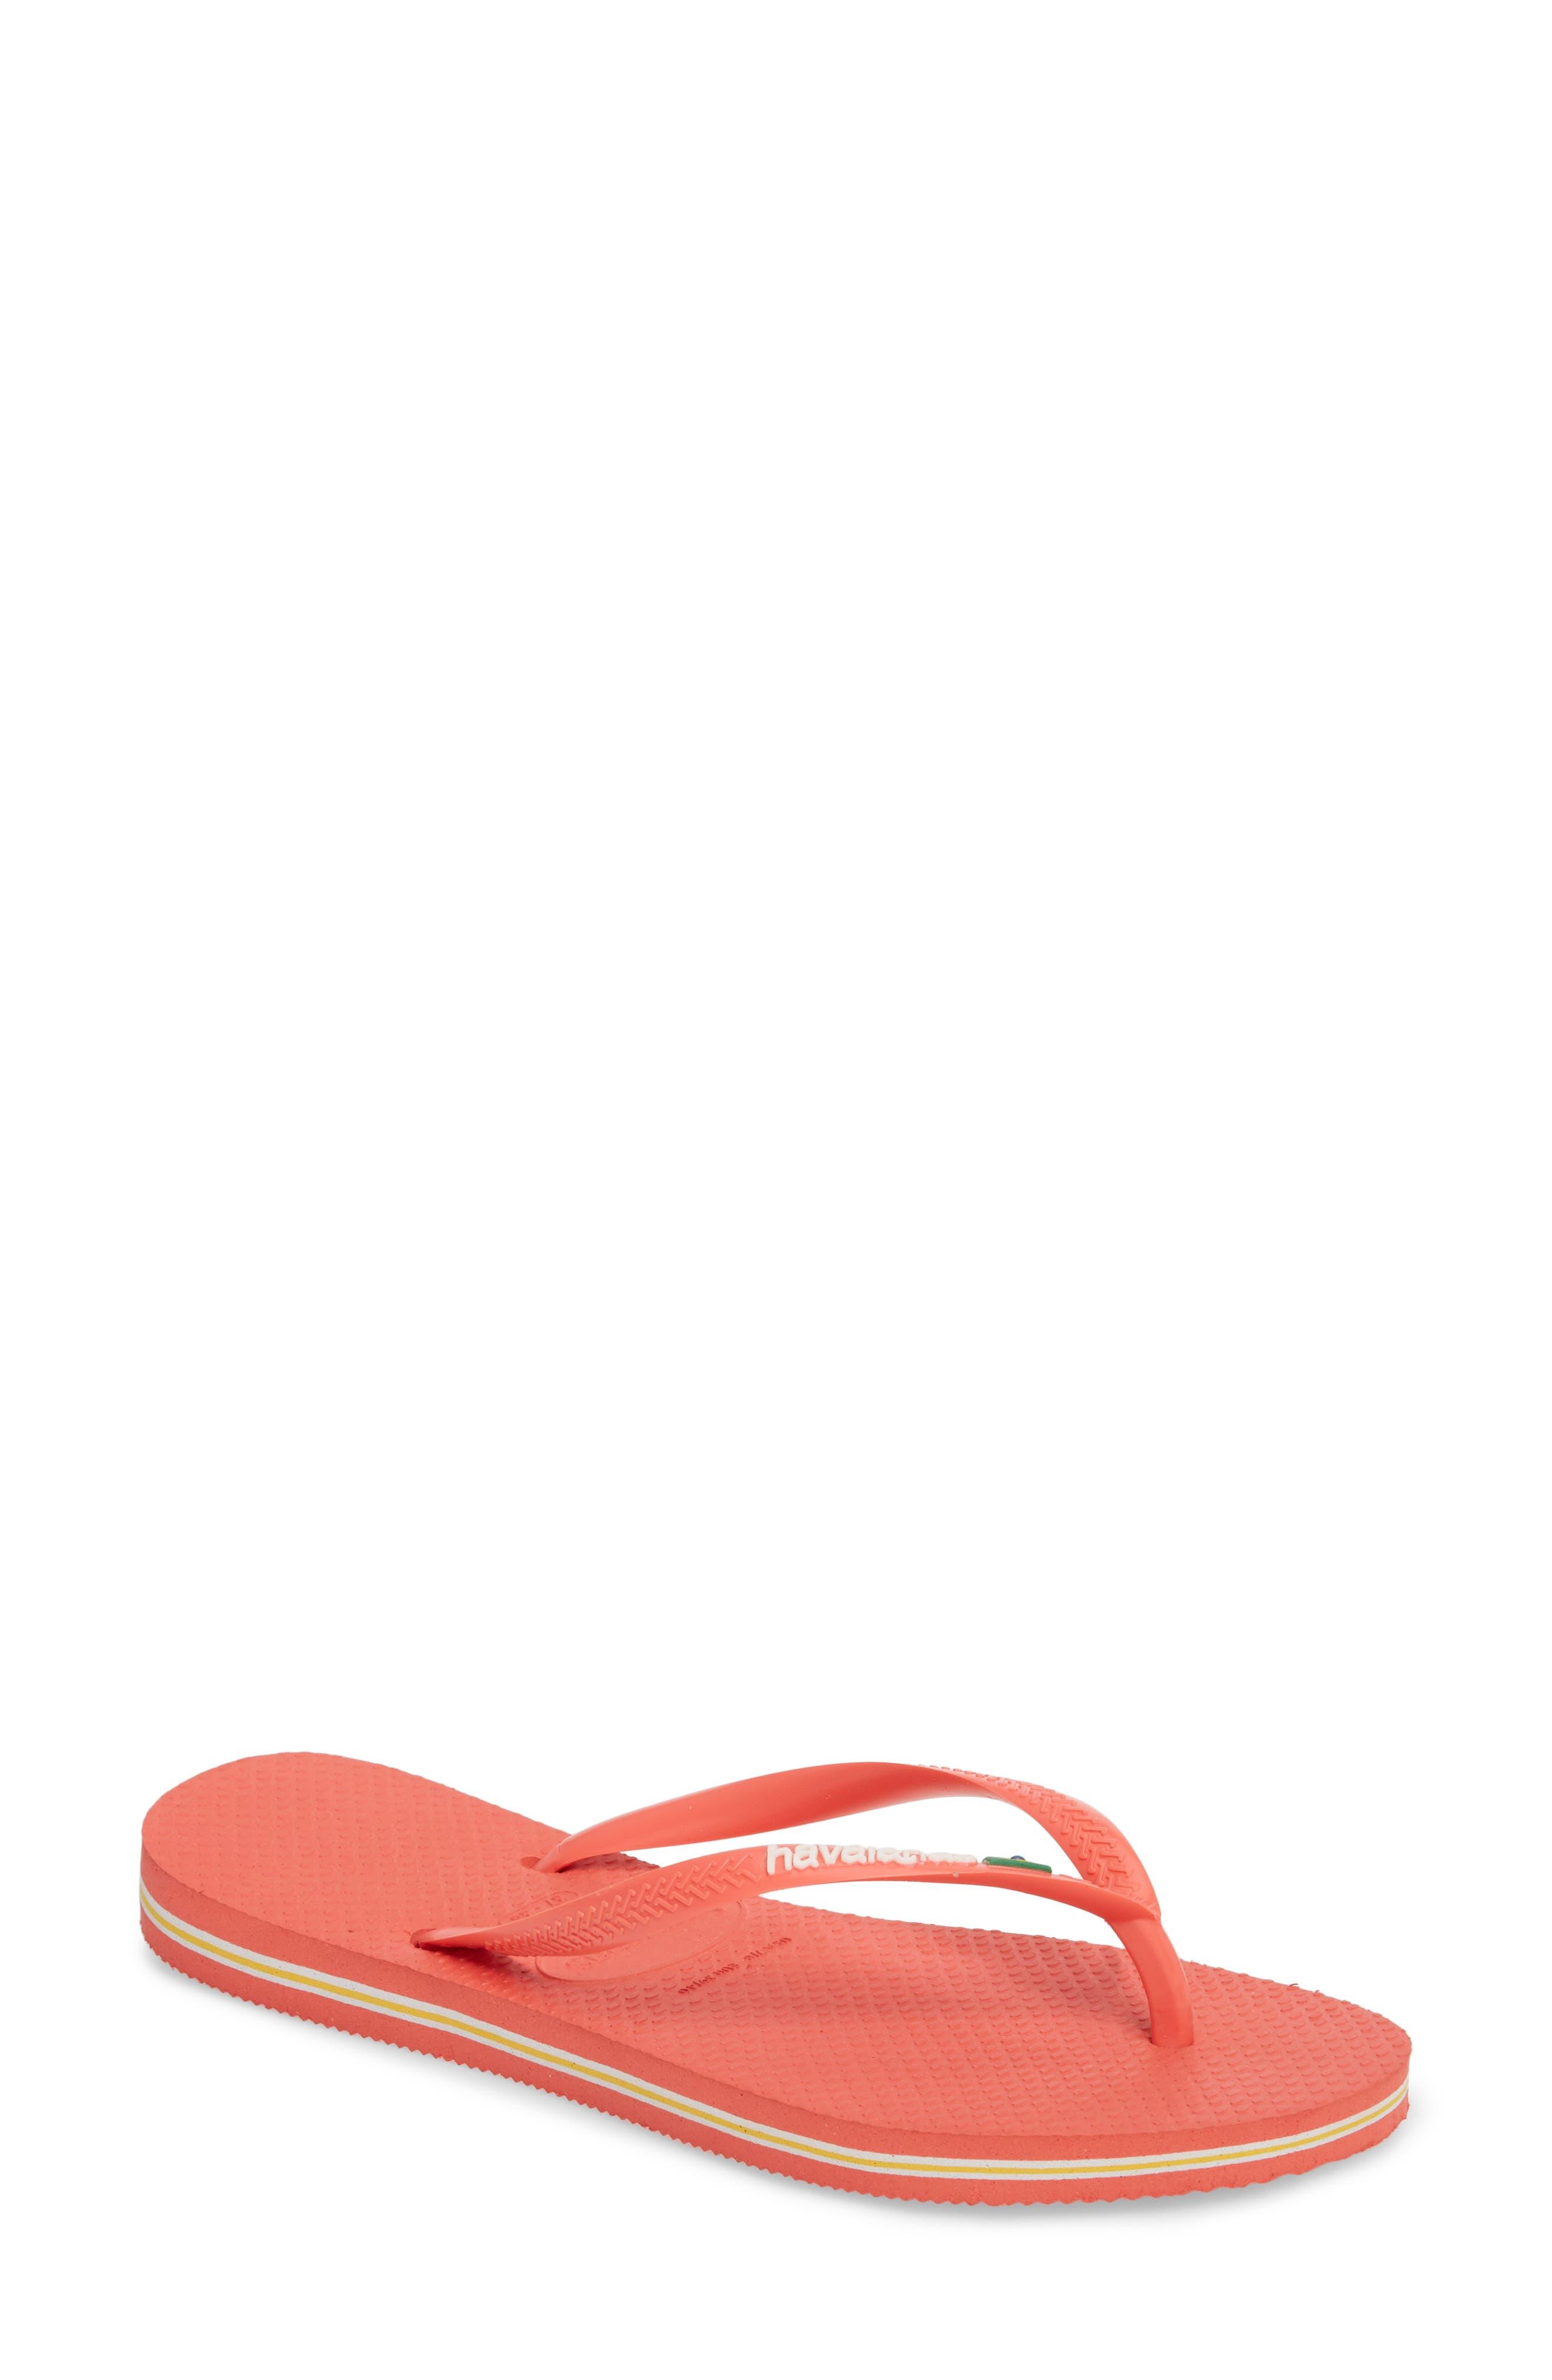 Havianas Slim Brazil Flip Flop,                         Main,                         color, Coral